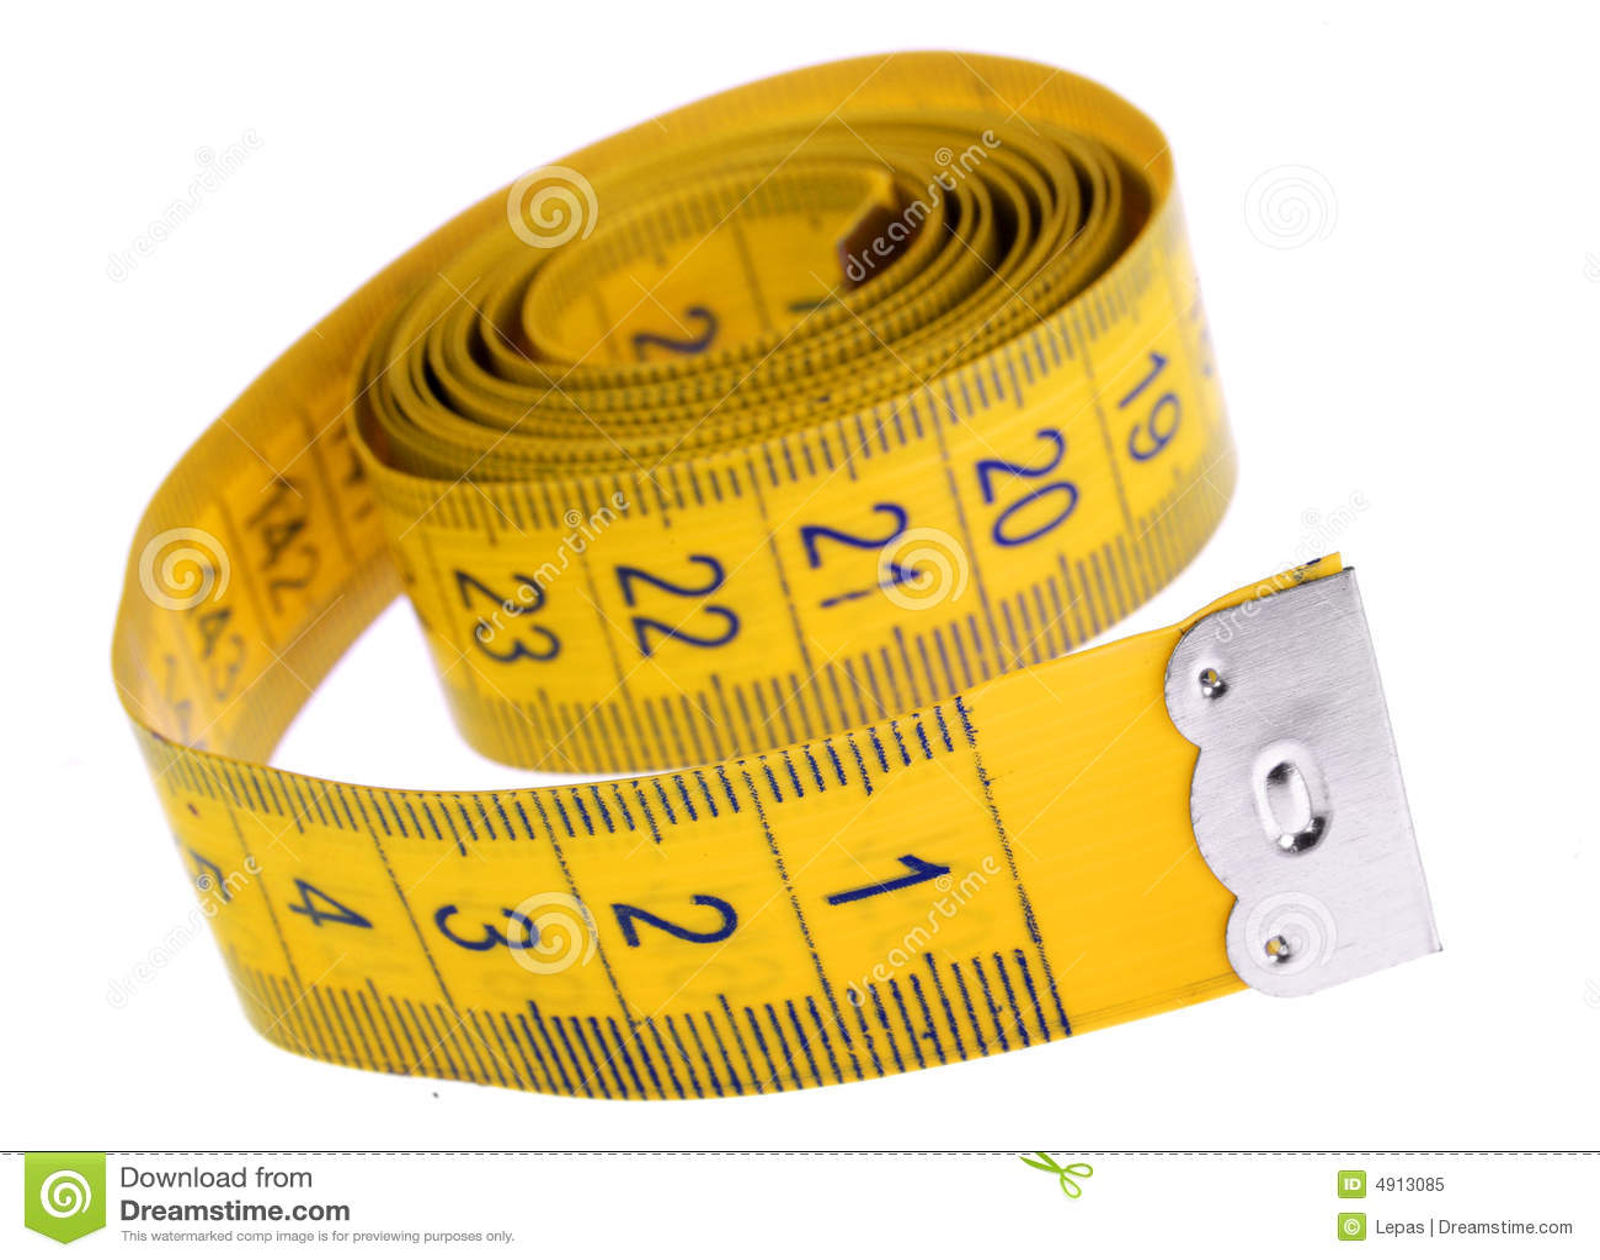 worksheet Centimeter centimeter tape royalty free stock photo image 4913085 tape